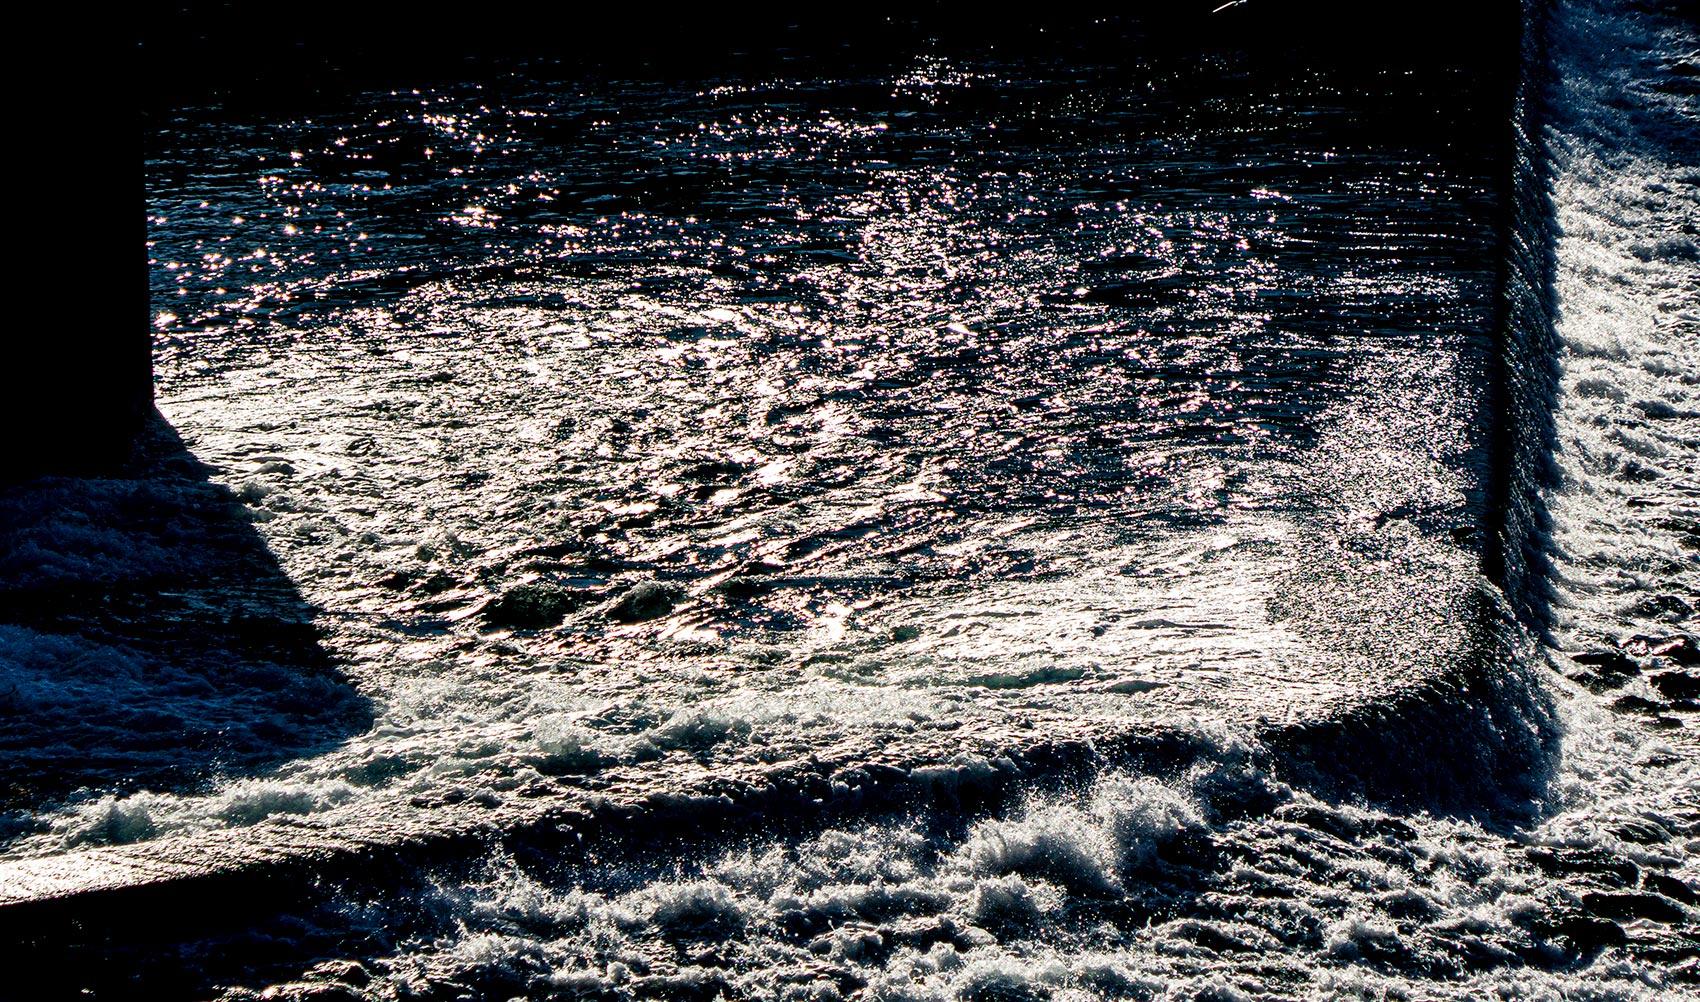 Joyside autunno acqua di seta immagini luci